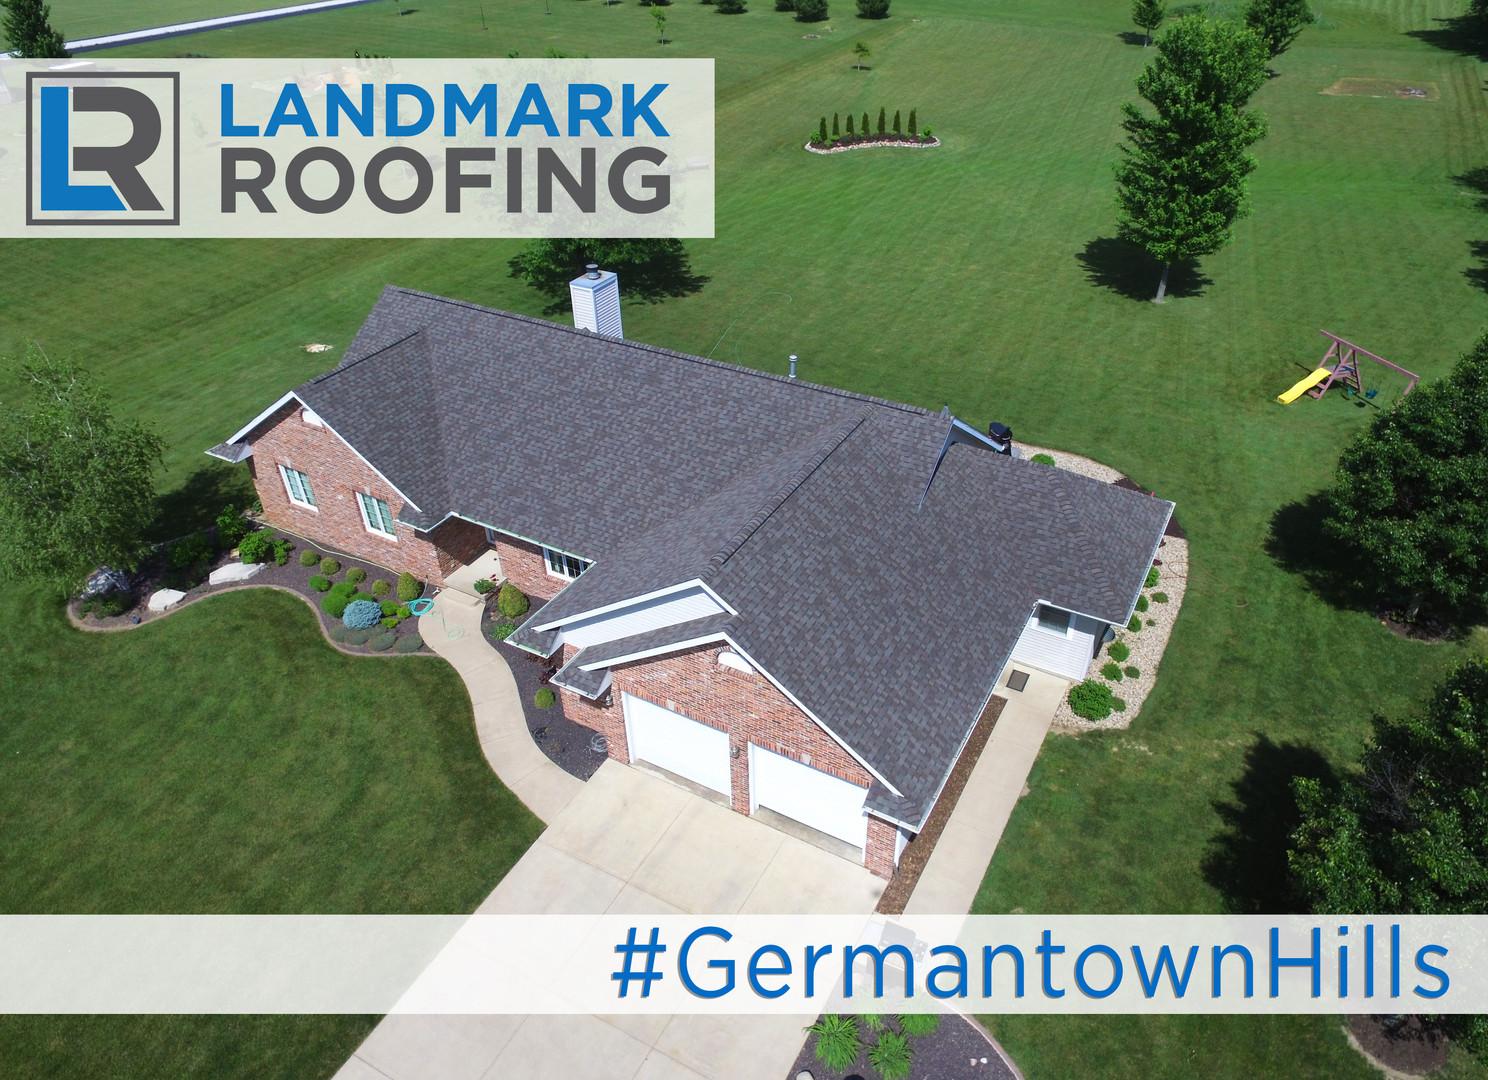 Landmark Roofing Germantown Hills IL 3 G